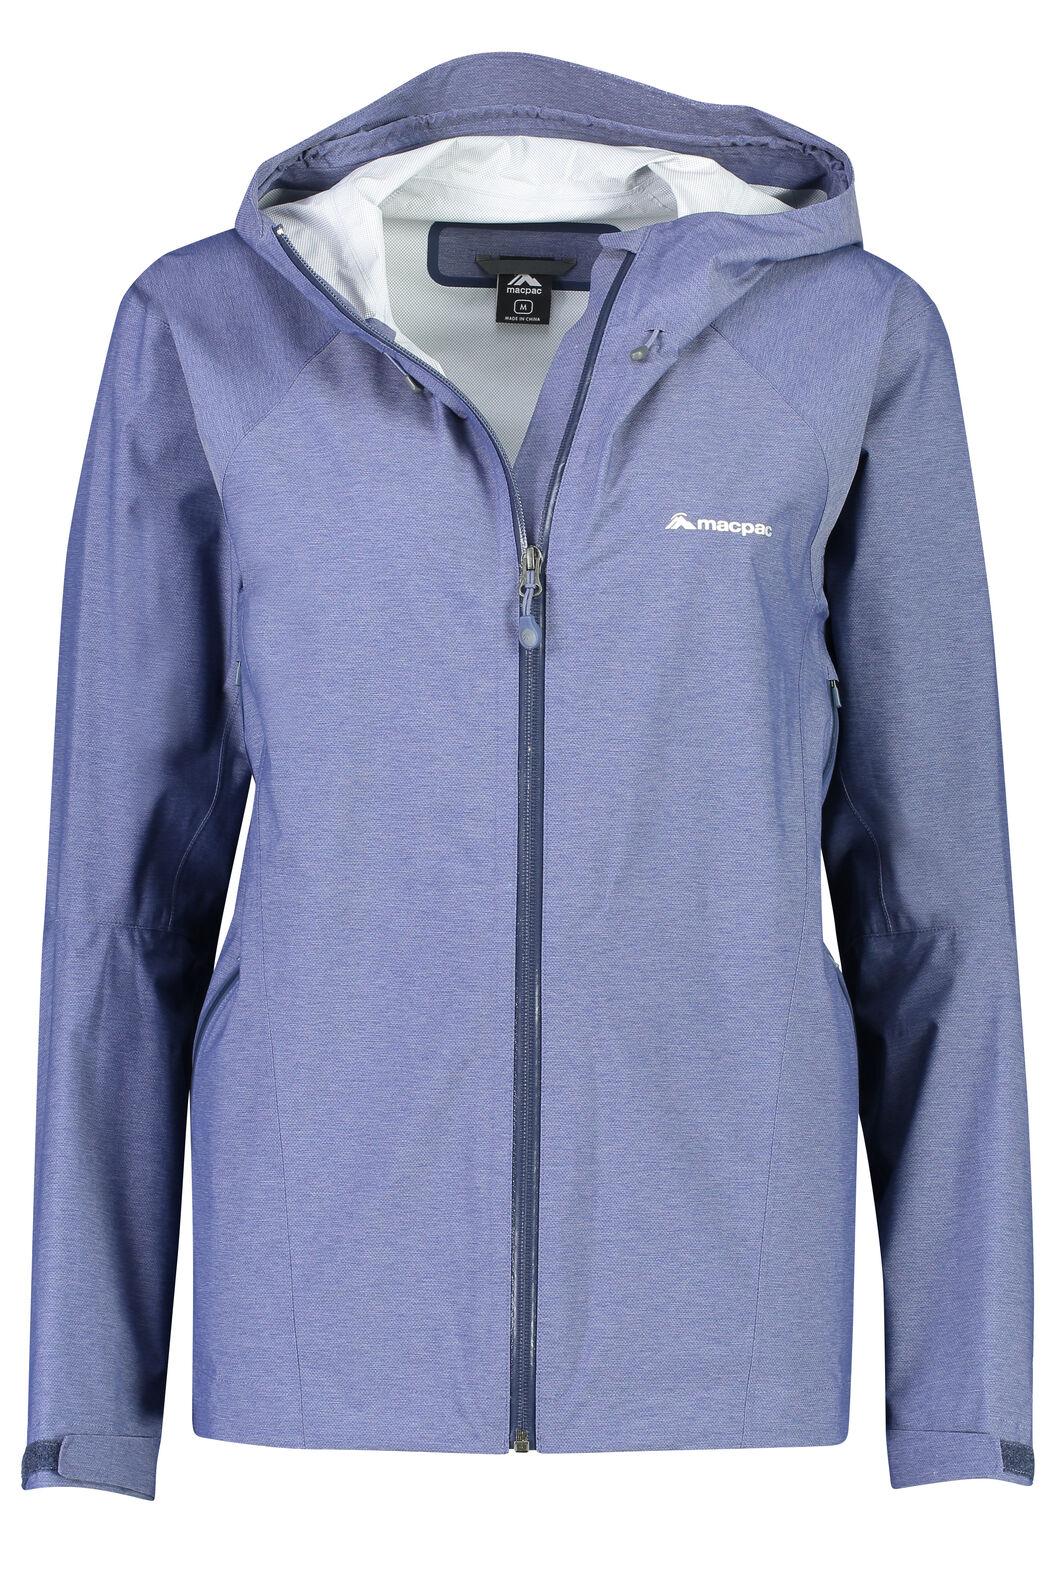 Macpac Less is less Rain Jacket - Women's, Medieval Blue, hi-res